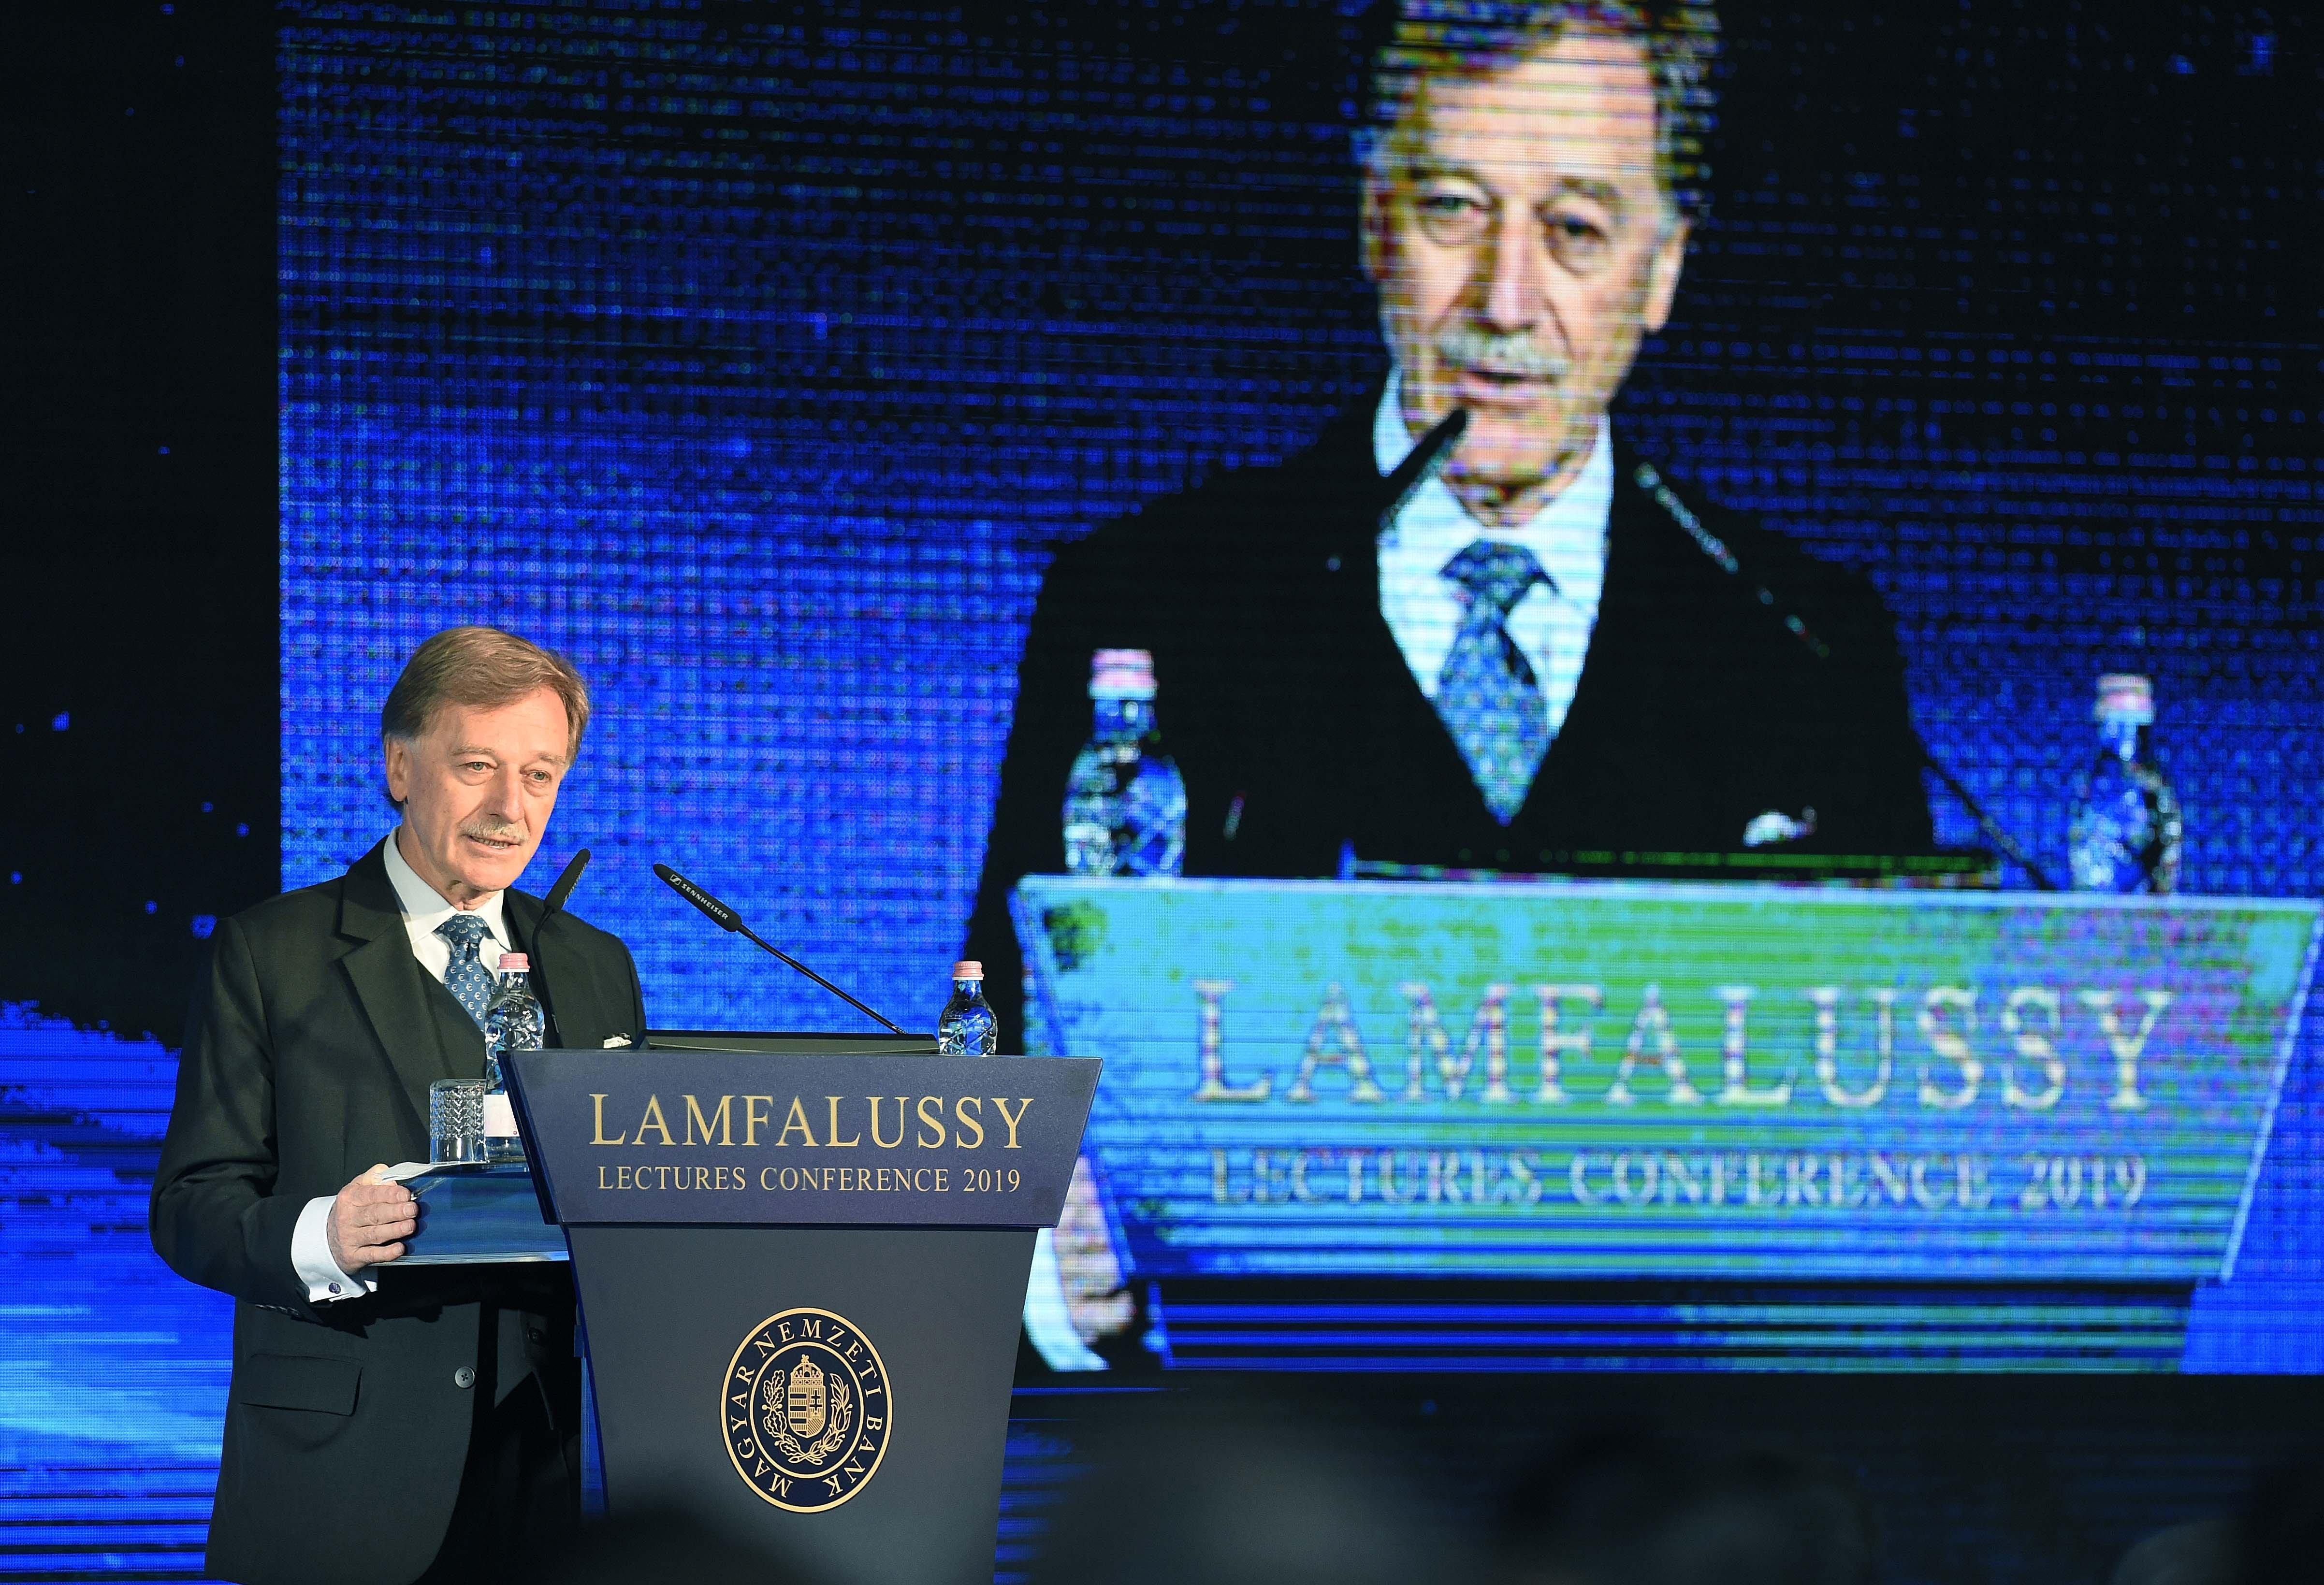 Lámfalussy Lectures Yves Mersch